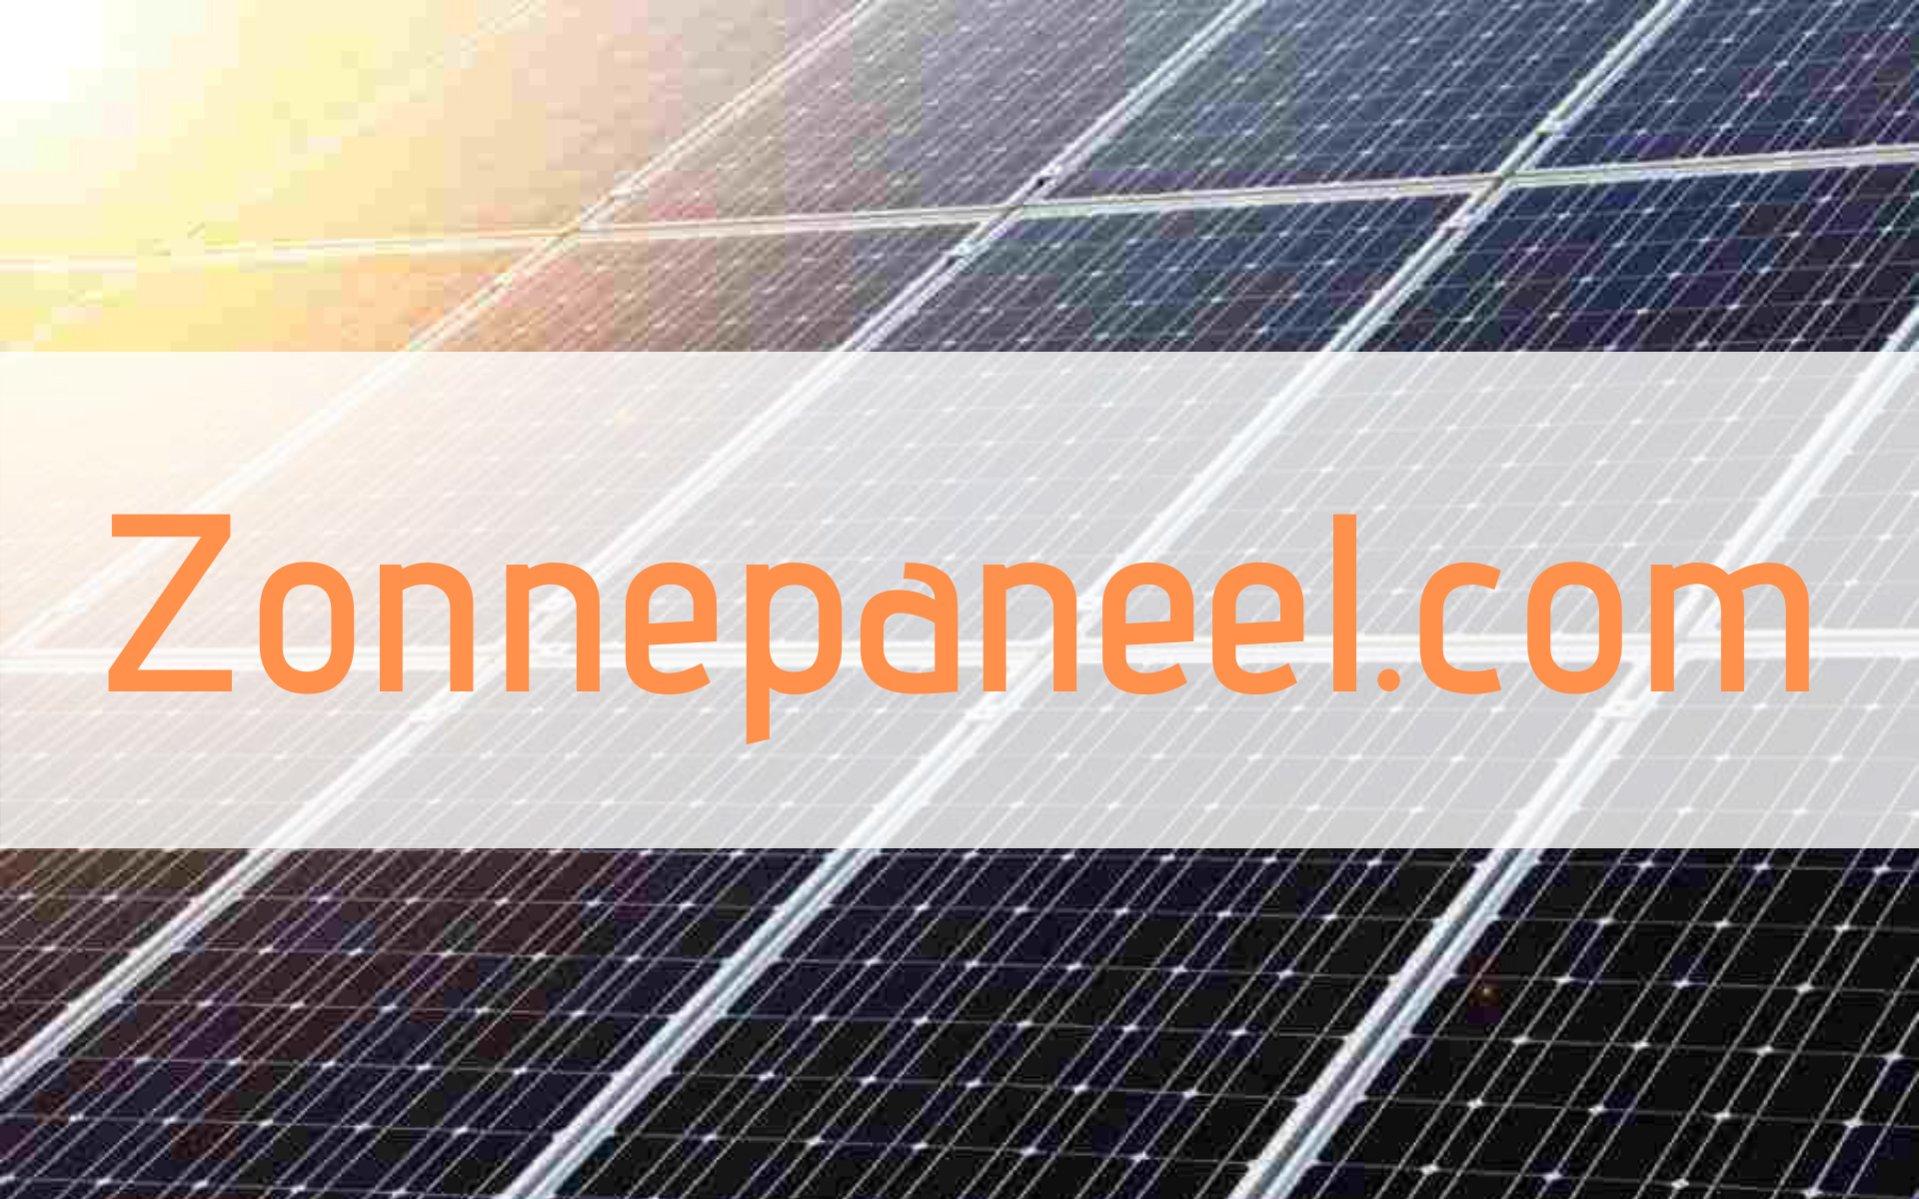 -zonnepaneel-banner-jpg